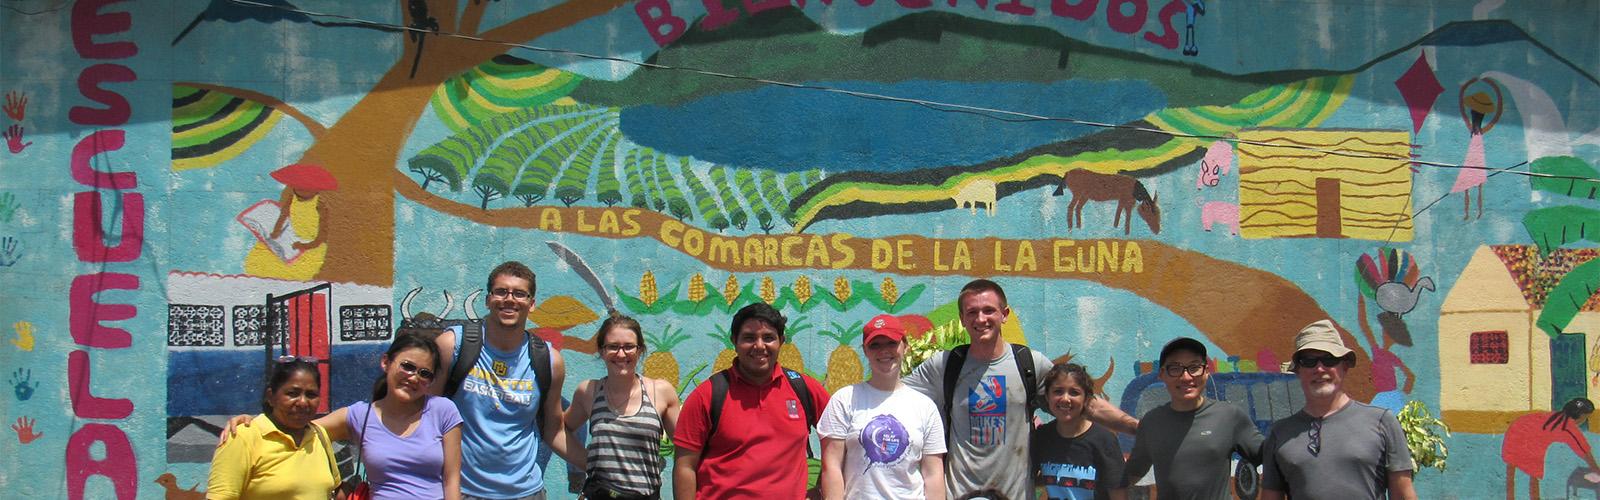 Earth Partnership - Nicaragua